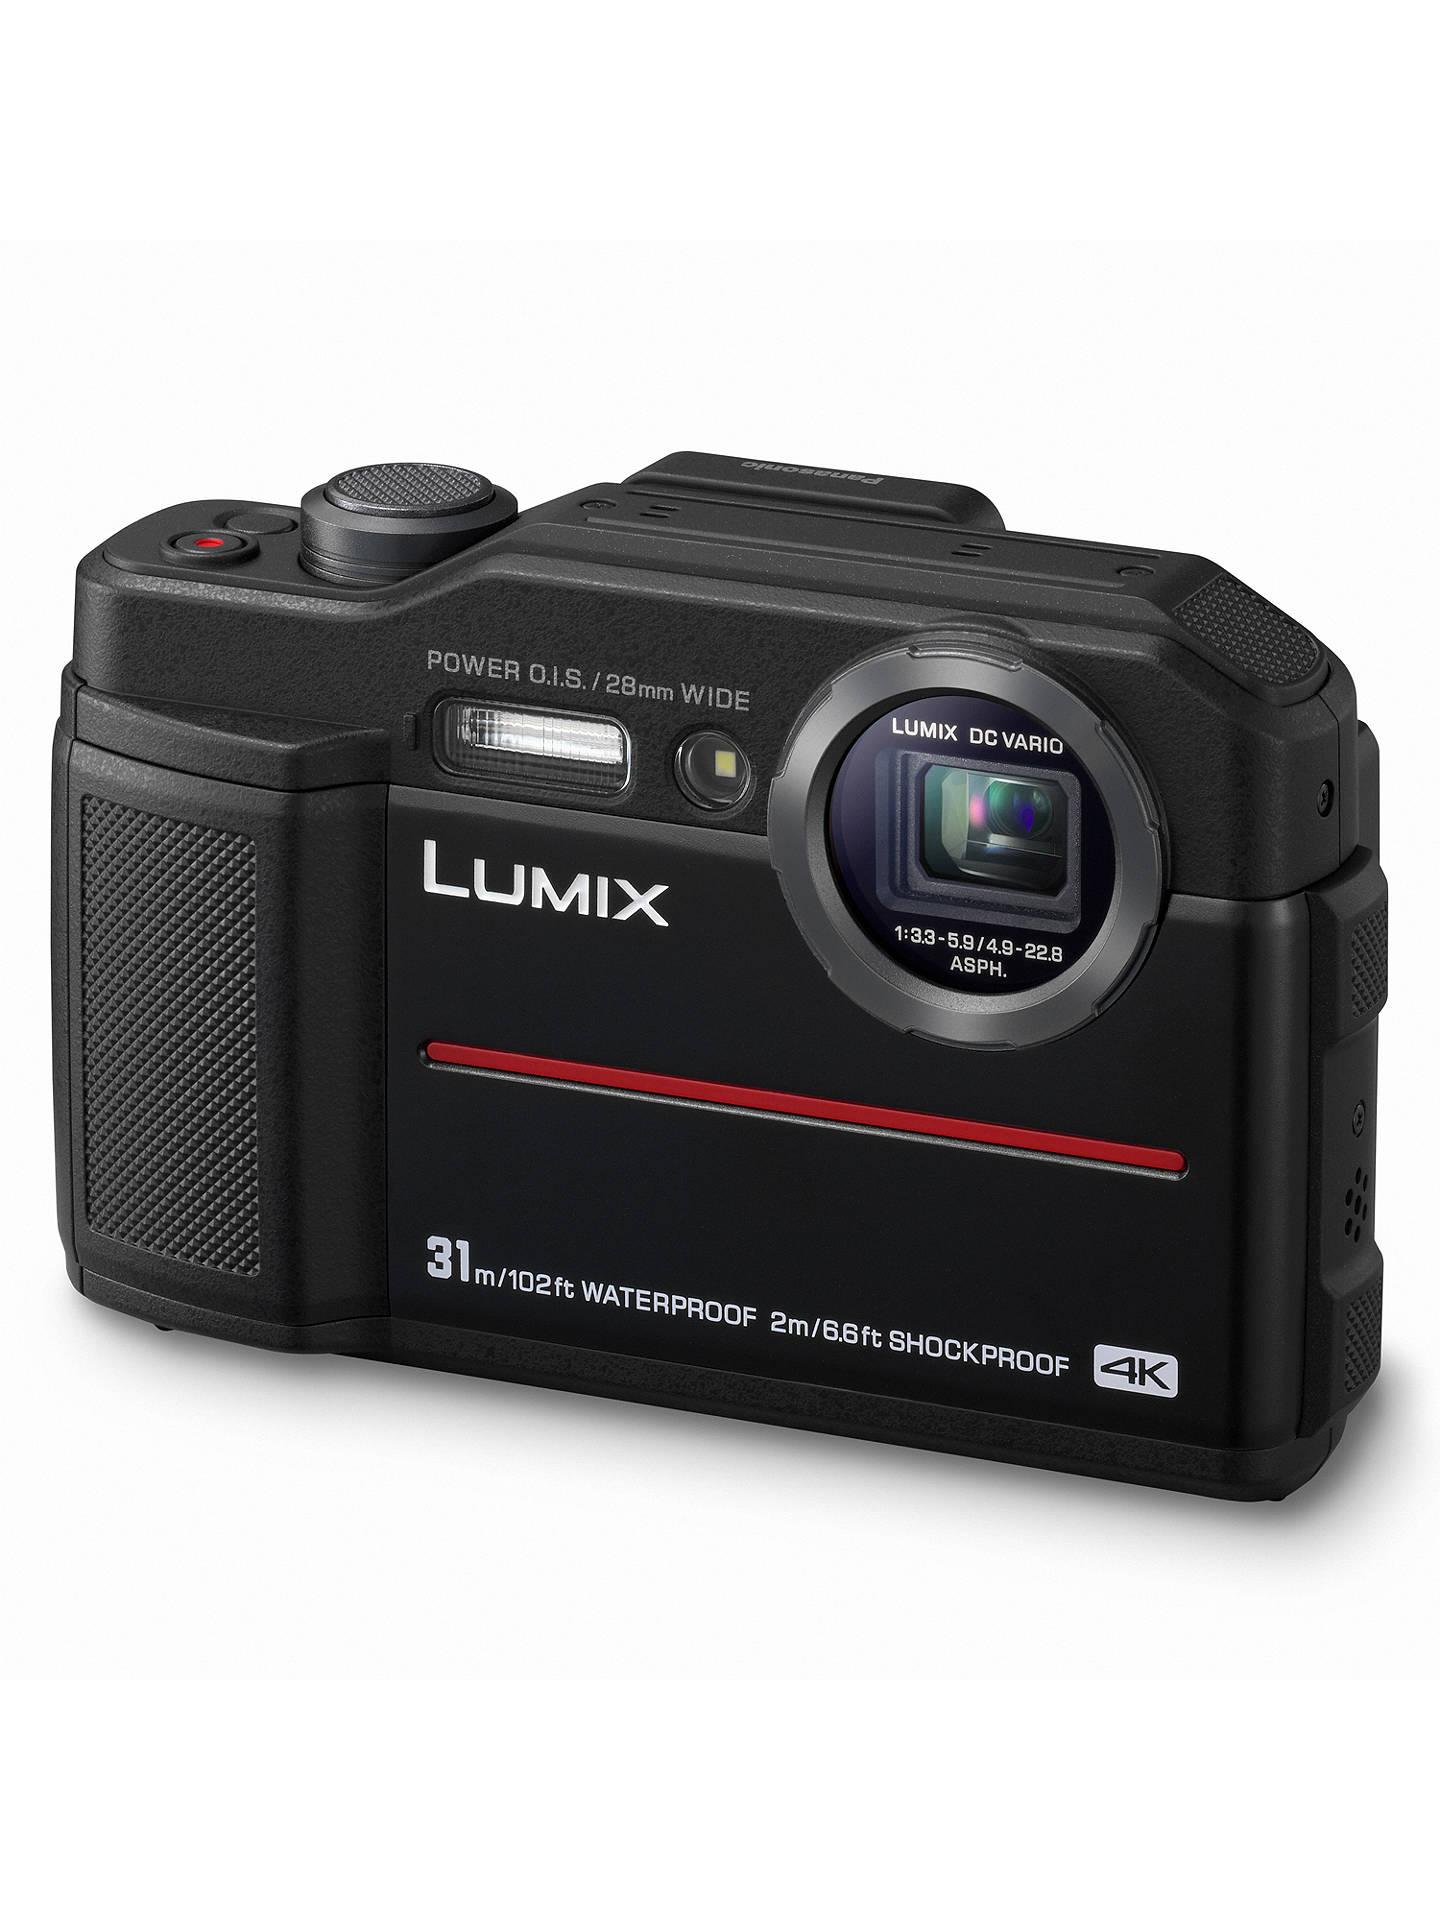 Panasonic Lumix FT7 tough waterproof camera, £279.99 @ John Lewis & partners plus £100 cashback